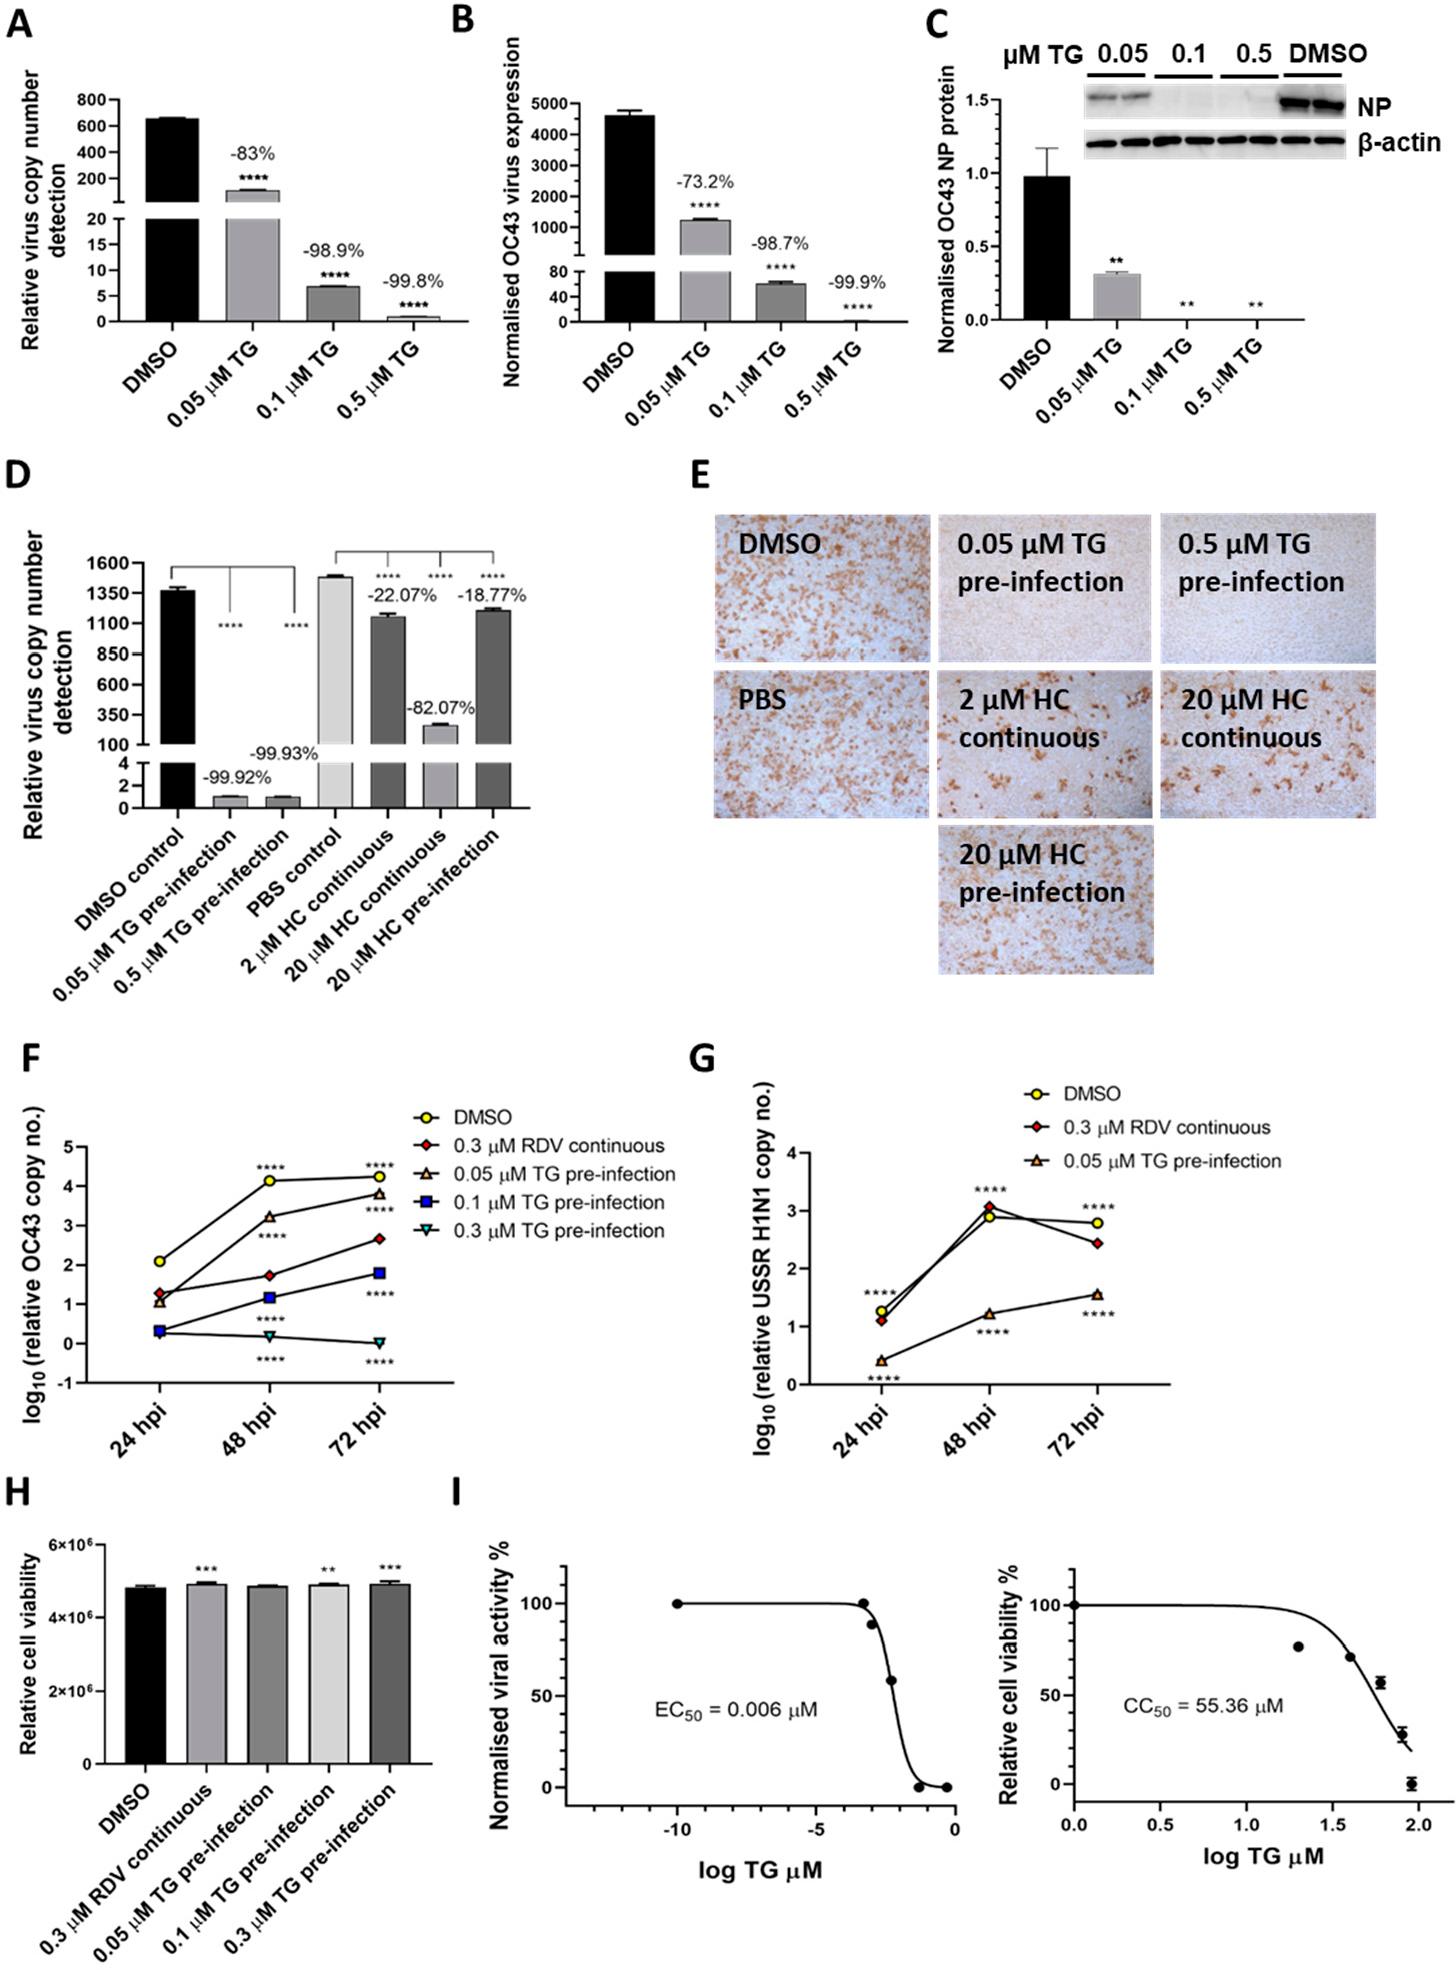 TG抑制OC43病毒的转录和蛋白质的产生,作为抗病毒剂比羟氯喹和瑞姆昔韦更有效,并且显示出高选择性。 .png